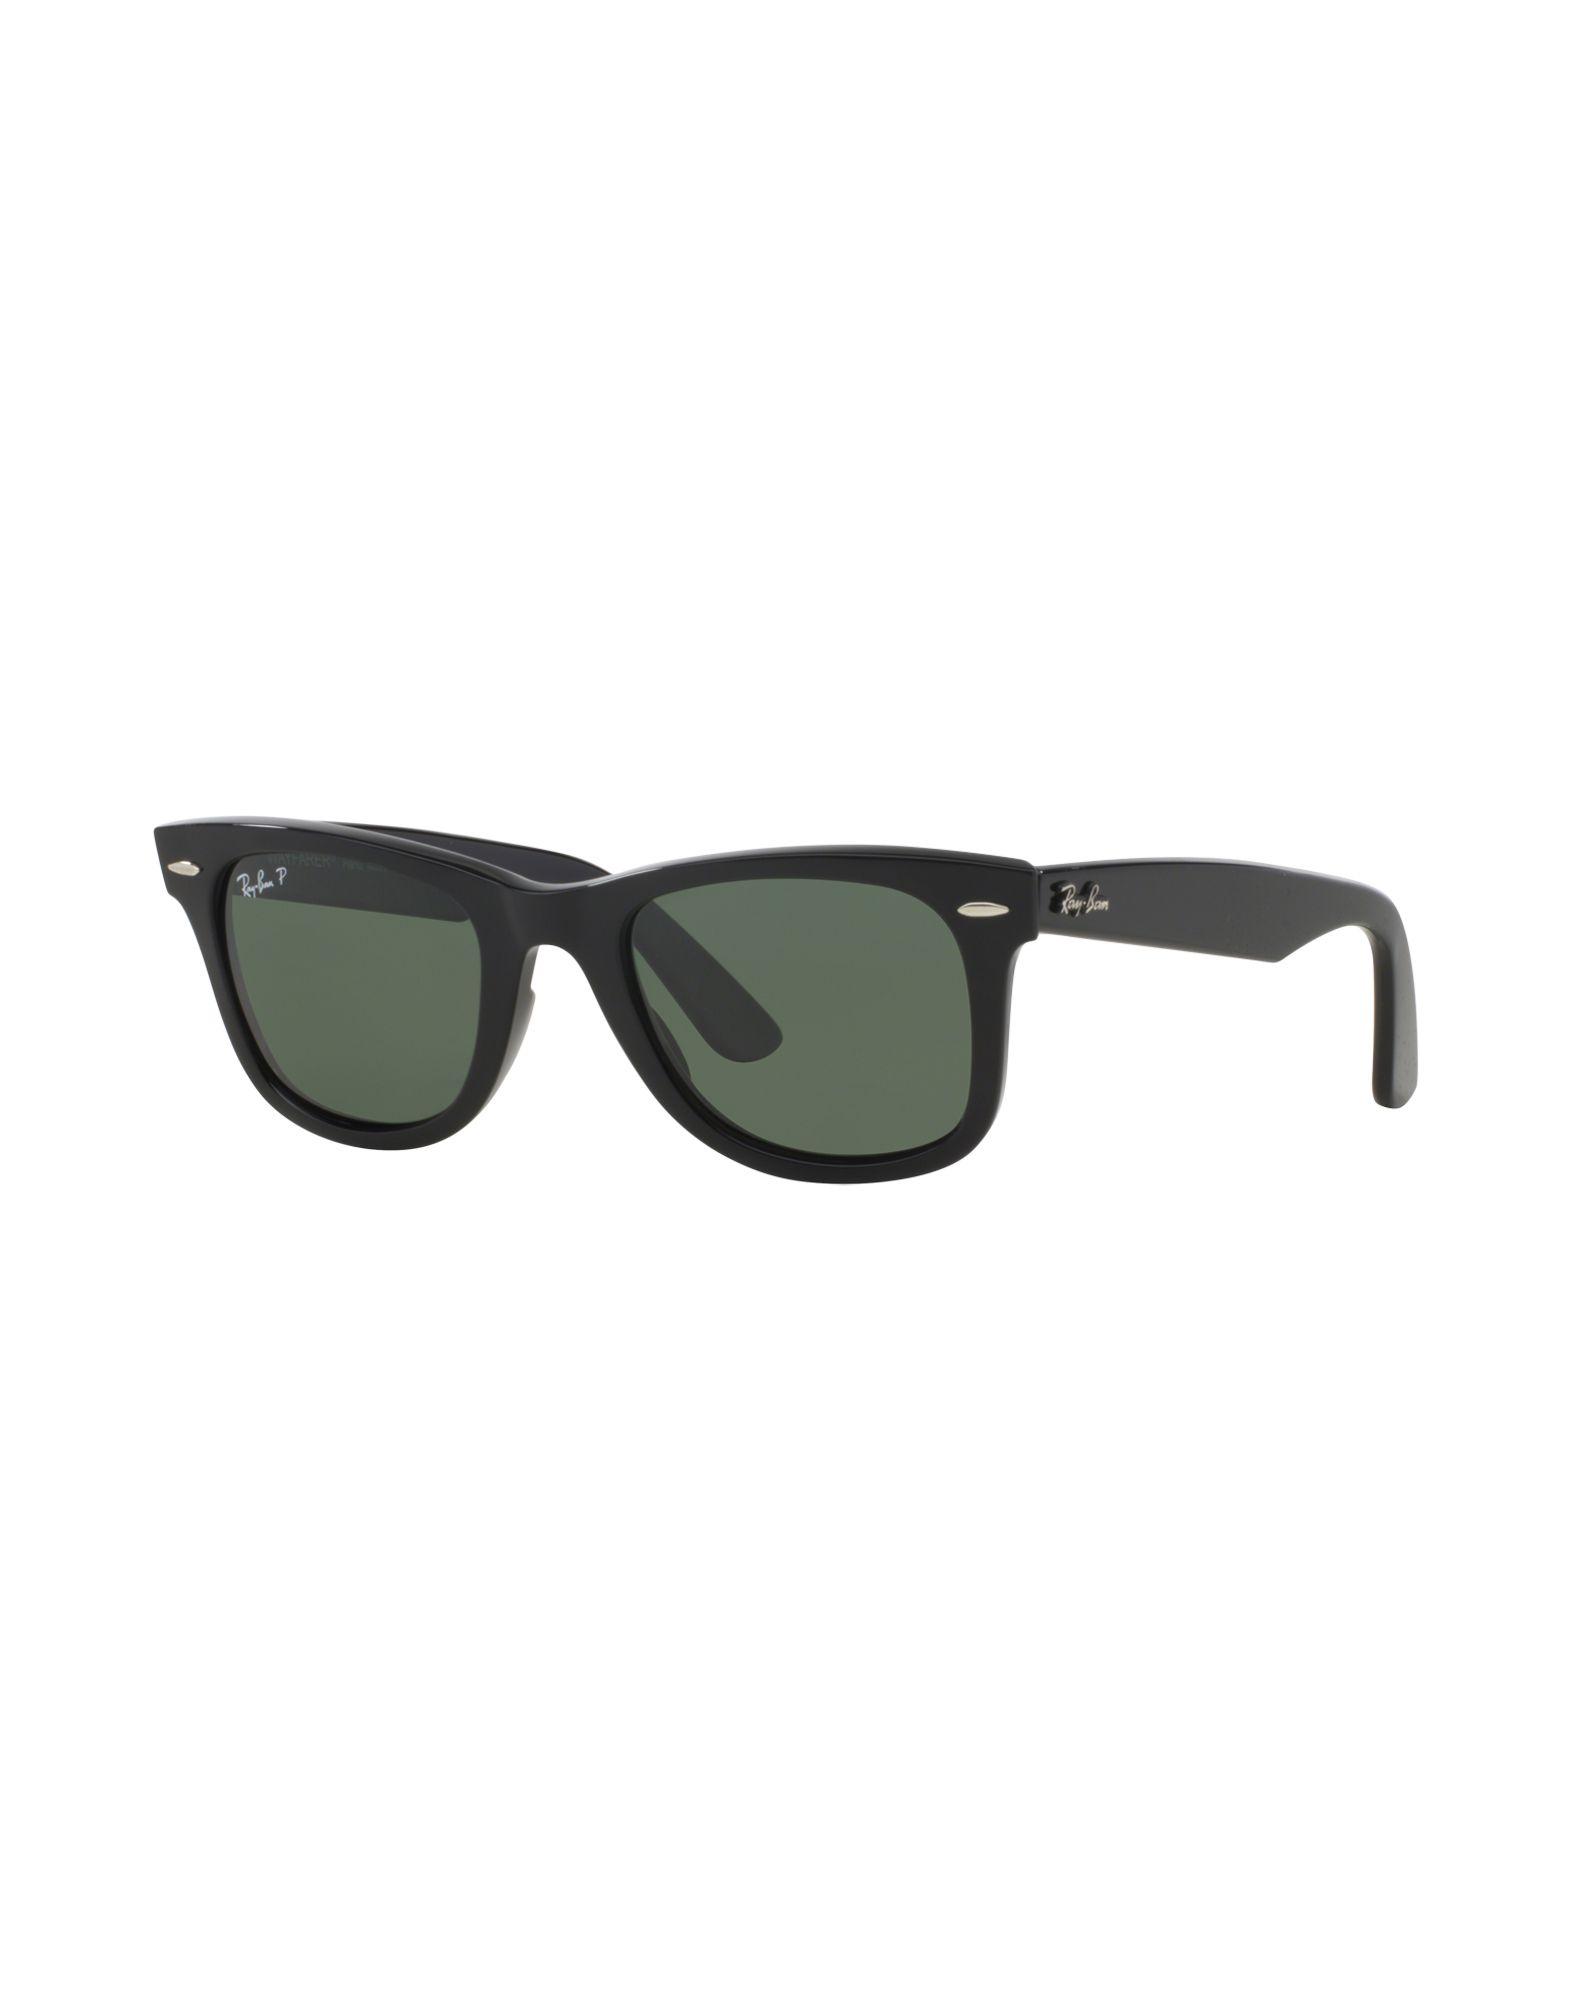 Occhiali Da Sole Ray-Ban Rb2140 Wayfarer - Uomo - Acquista online su